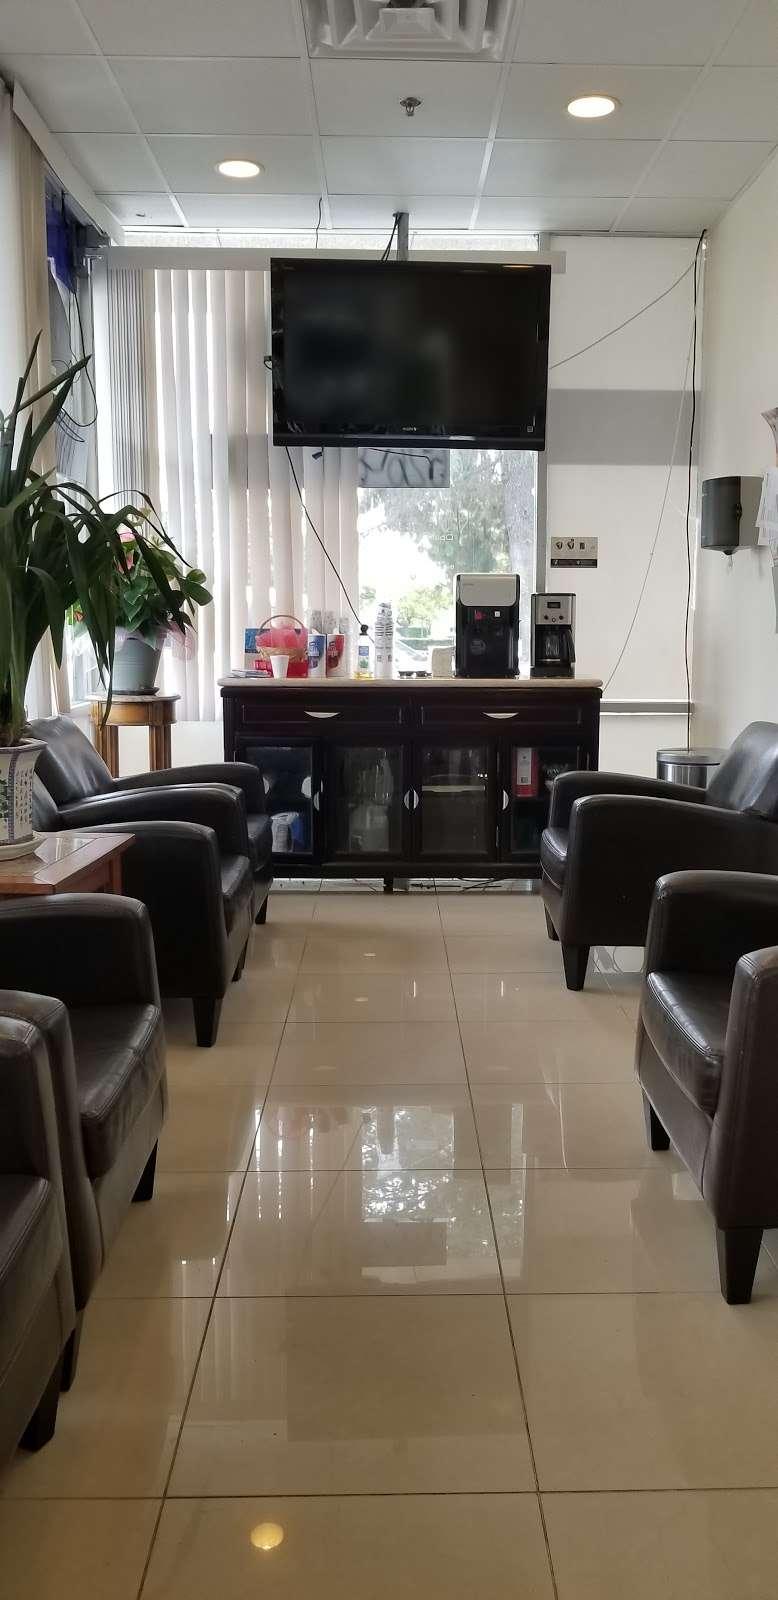 21 Dental Group - dentist  | Photo 1 of 7 | Address: 21 W Duarte Rd, Arcadia, CA 91007, USA | Phone: (626) 821-9970